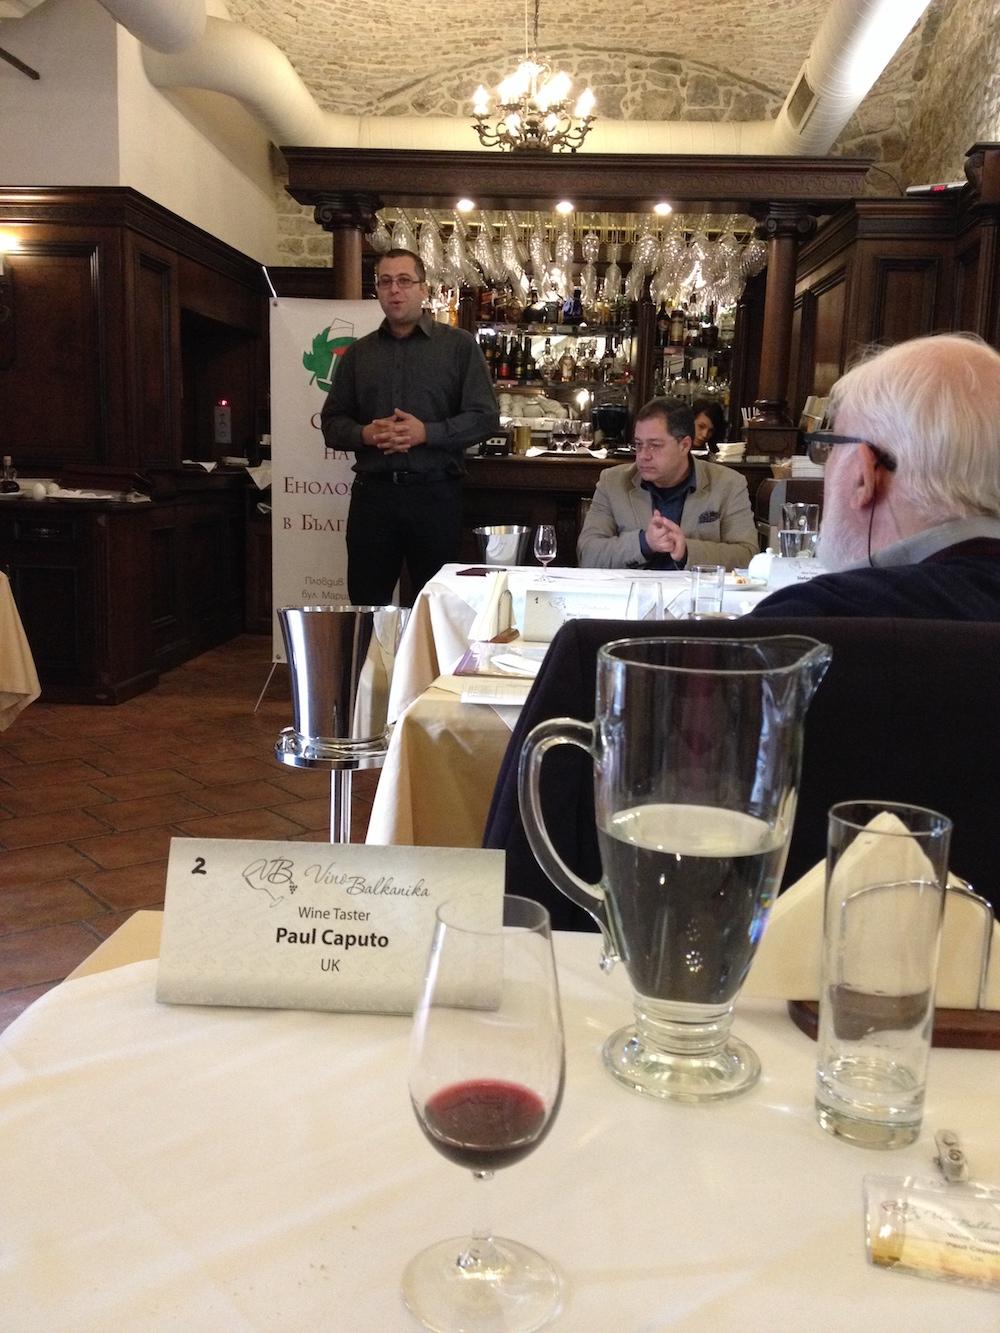 The intimate Vino Balkanika tasting